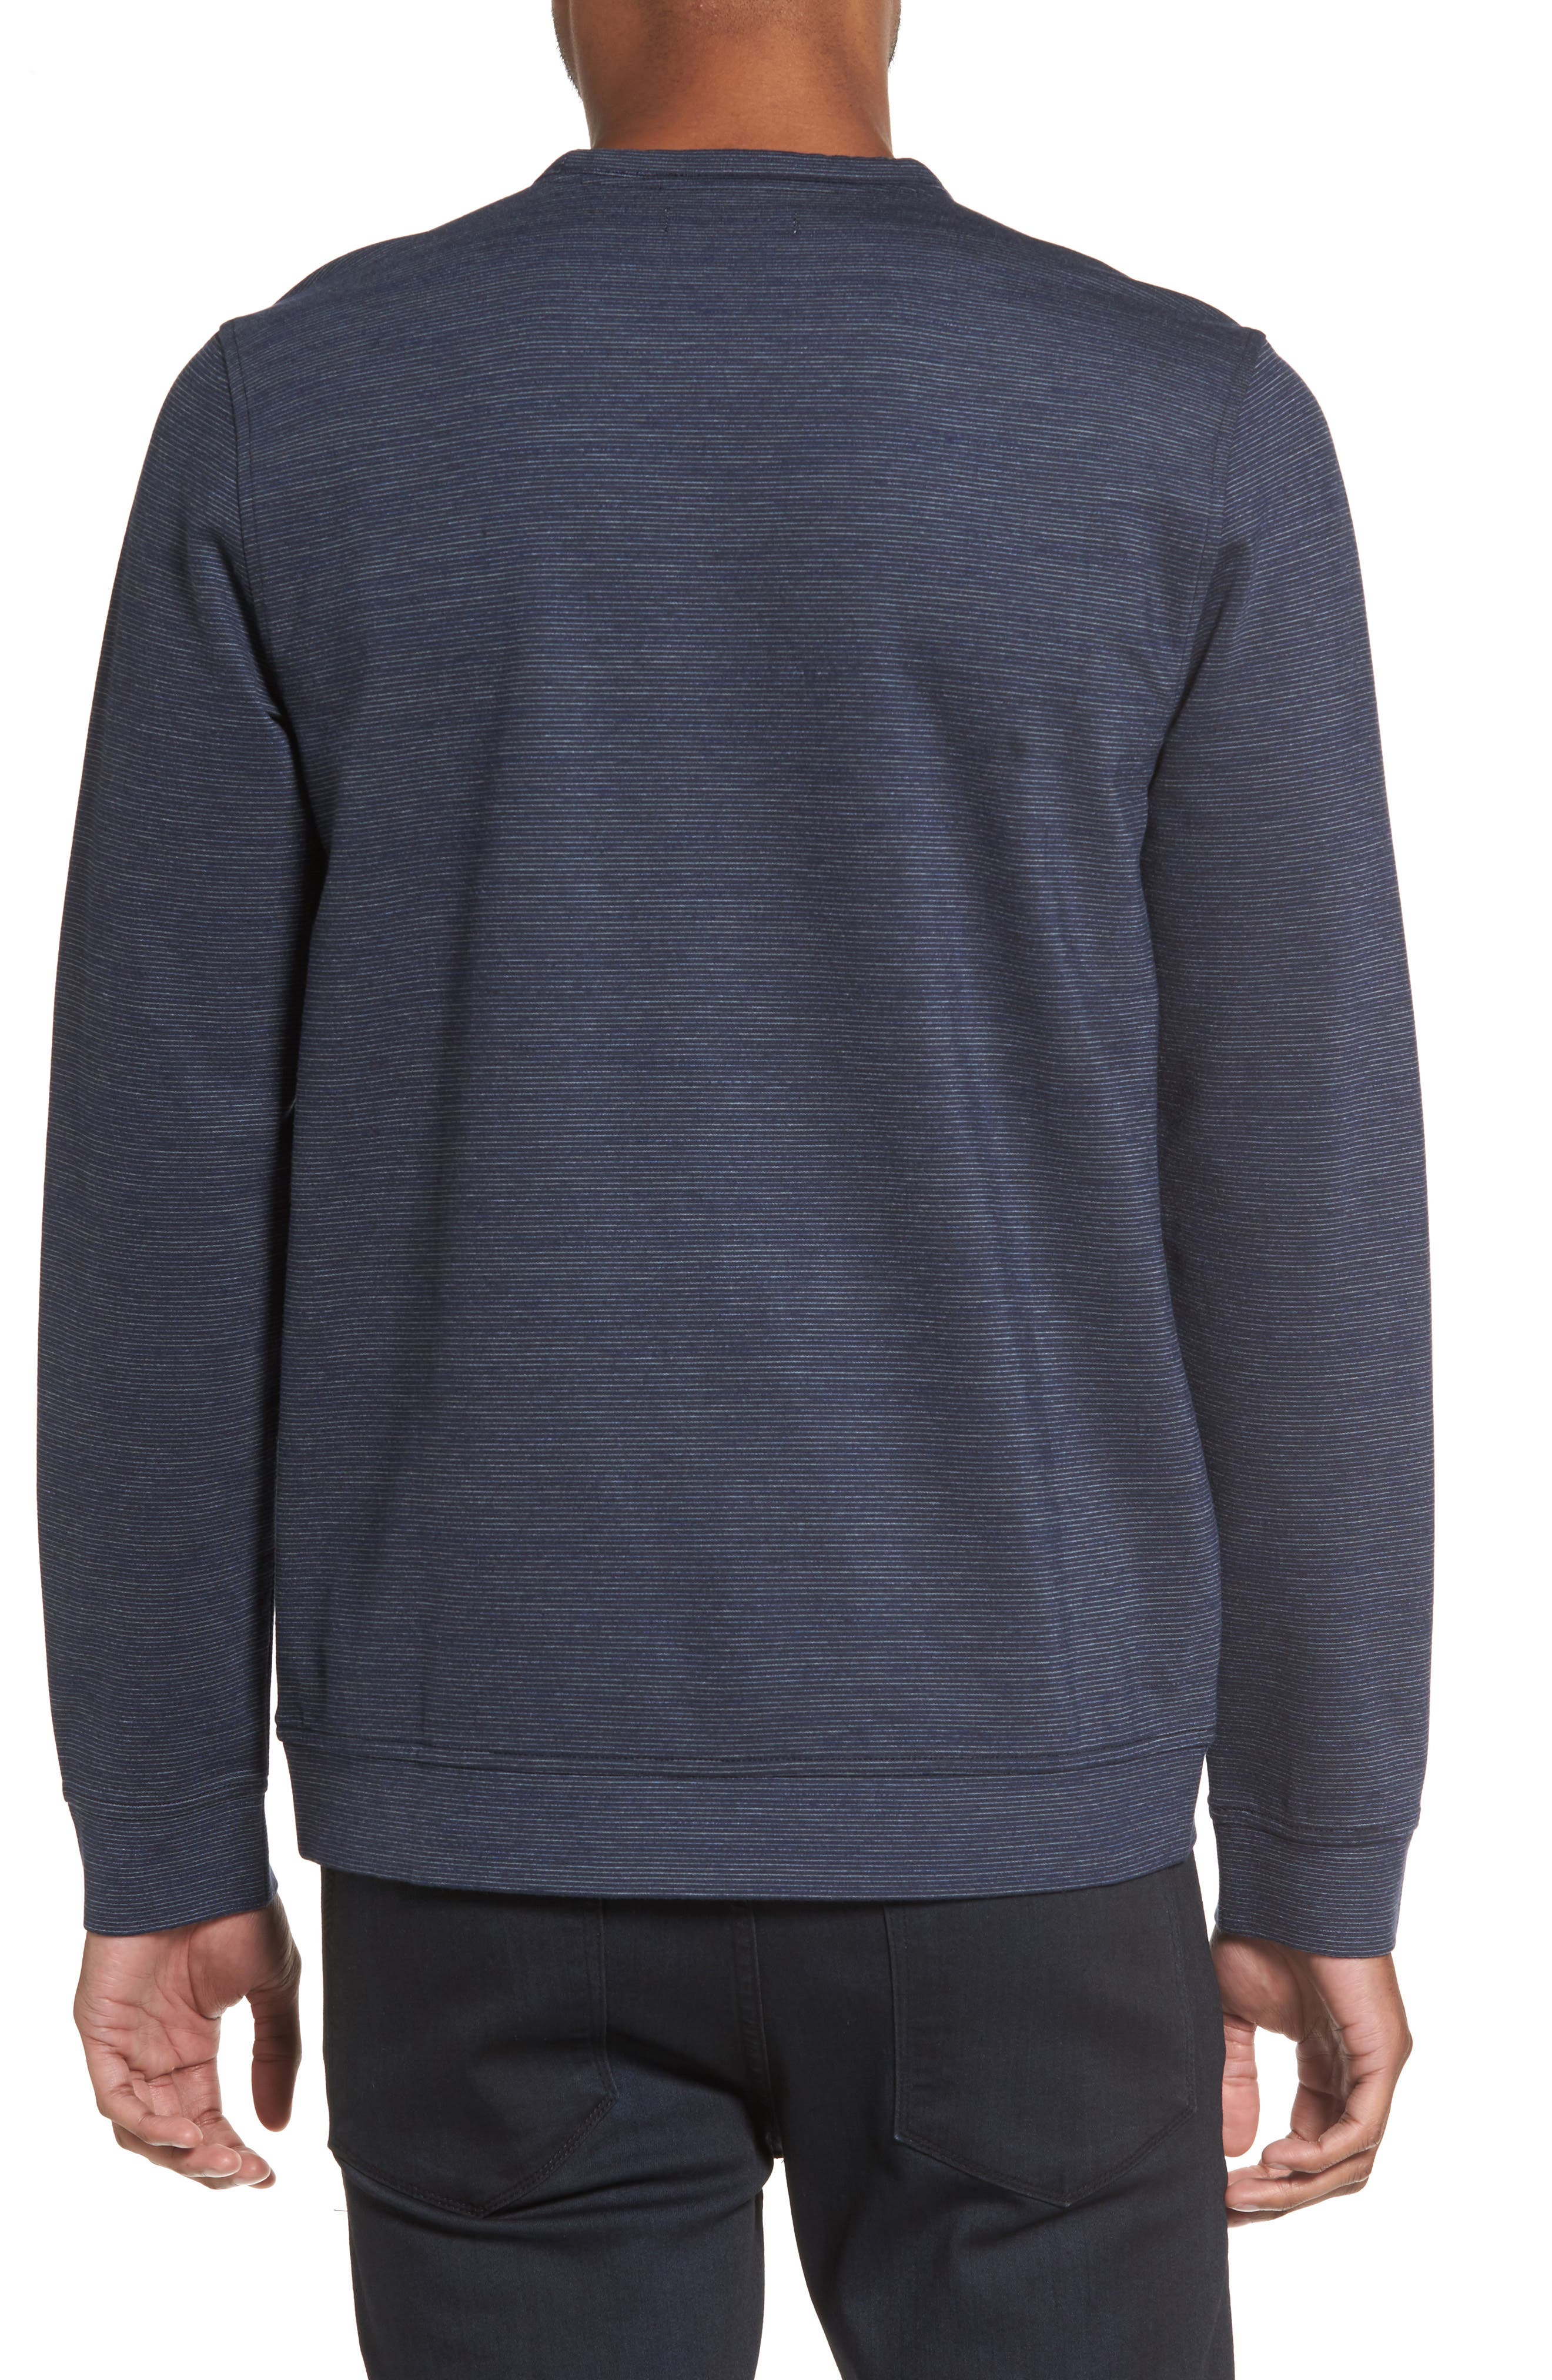 Space Dye Stripe Sweatshirt,                             Alternate thumbnail 2, color,                             Navy Night Spacedye